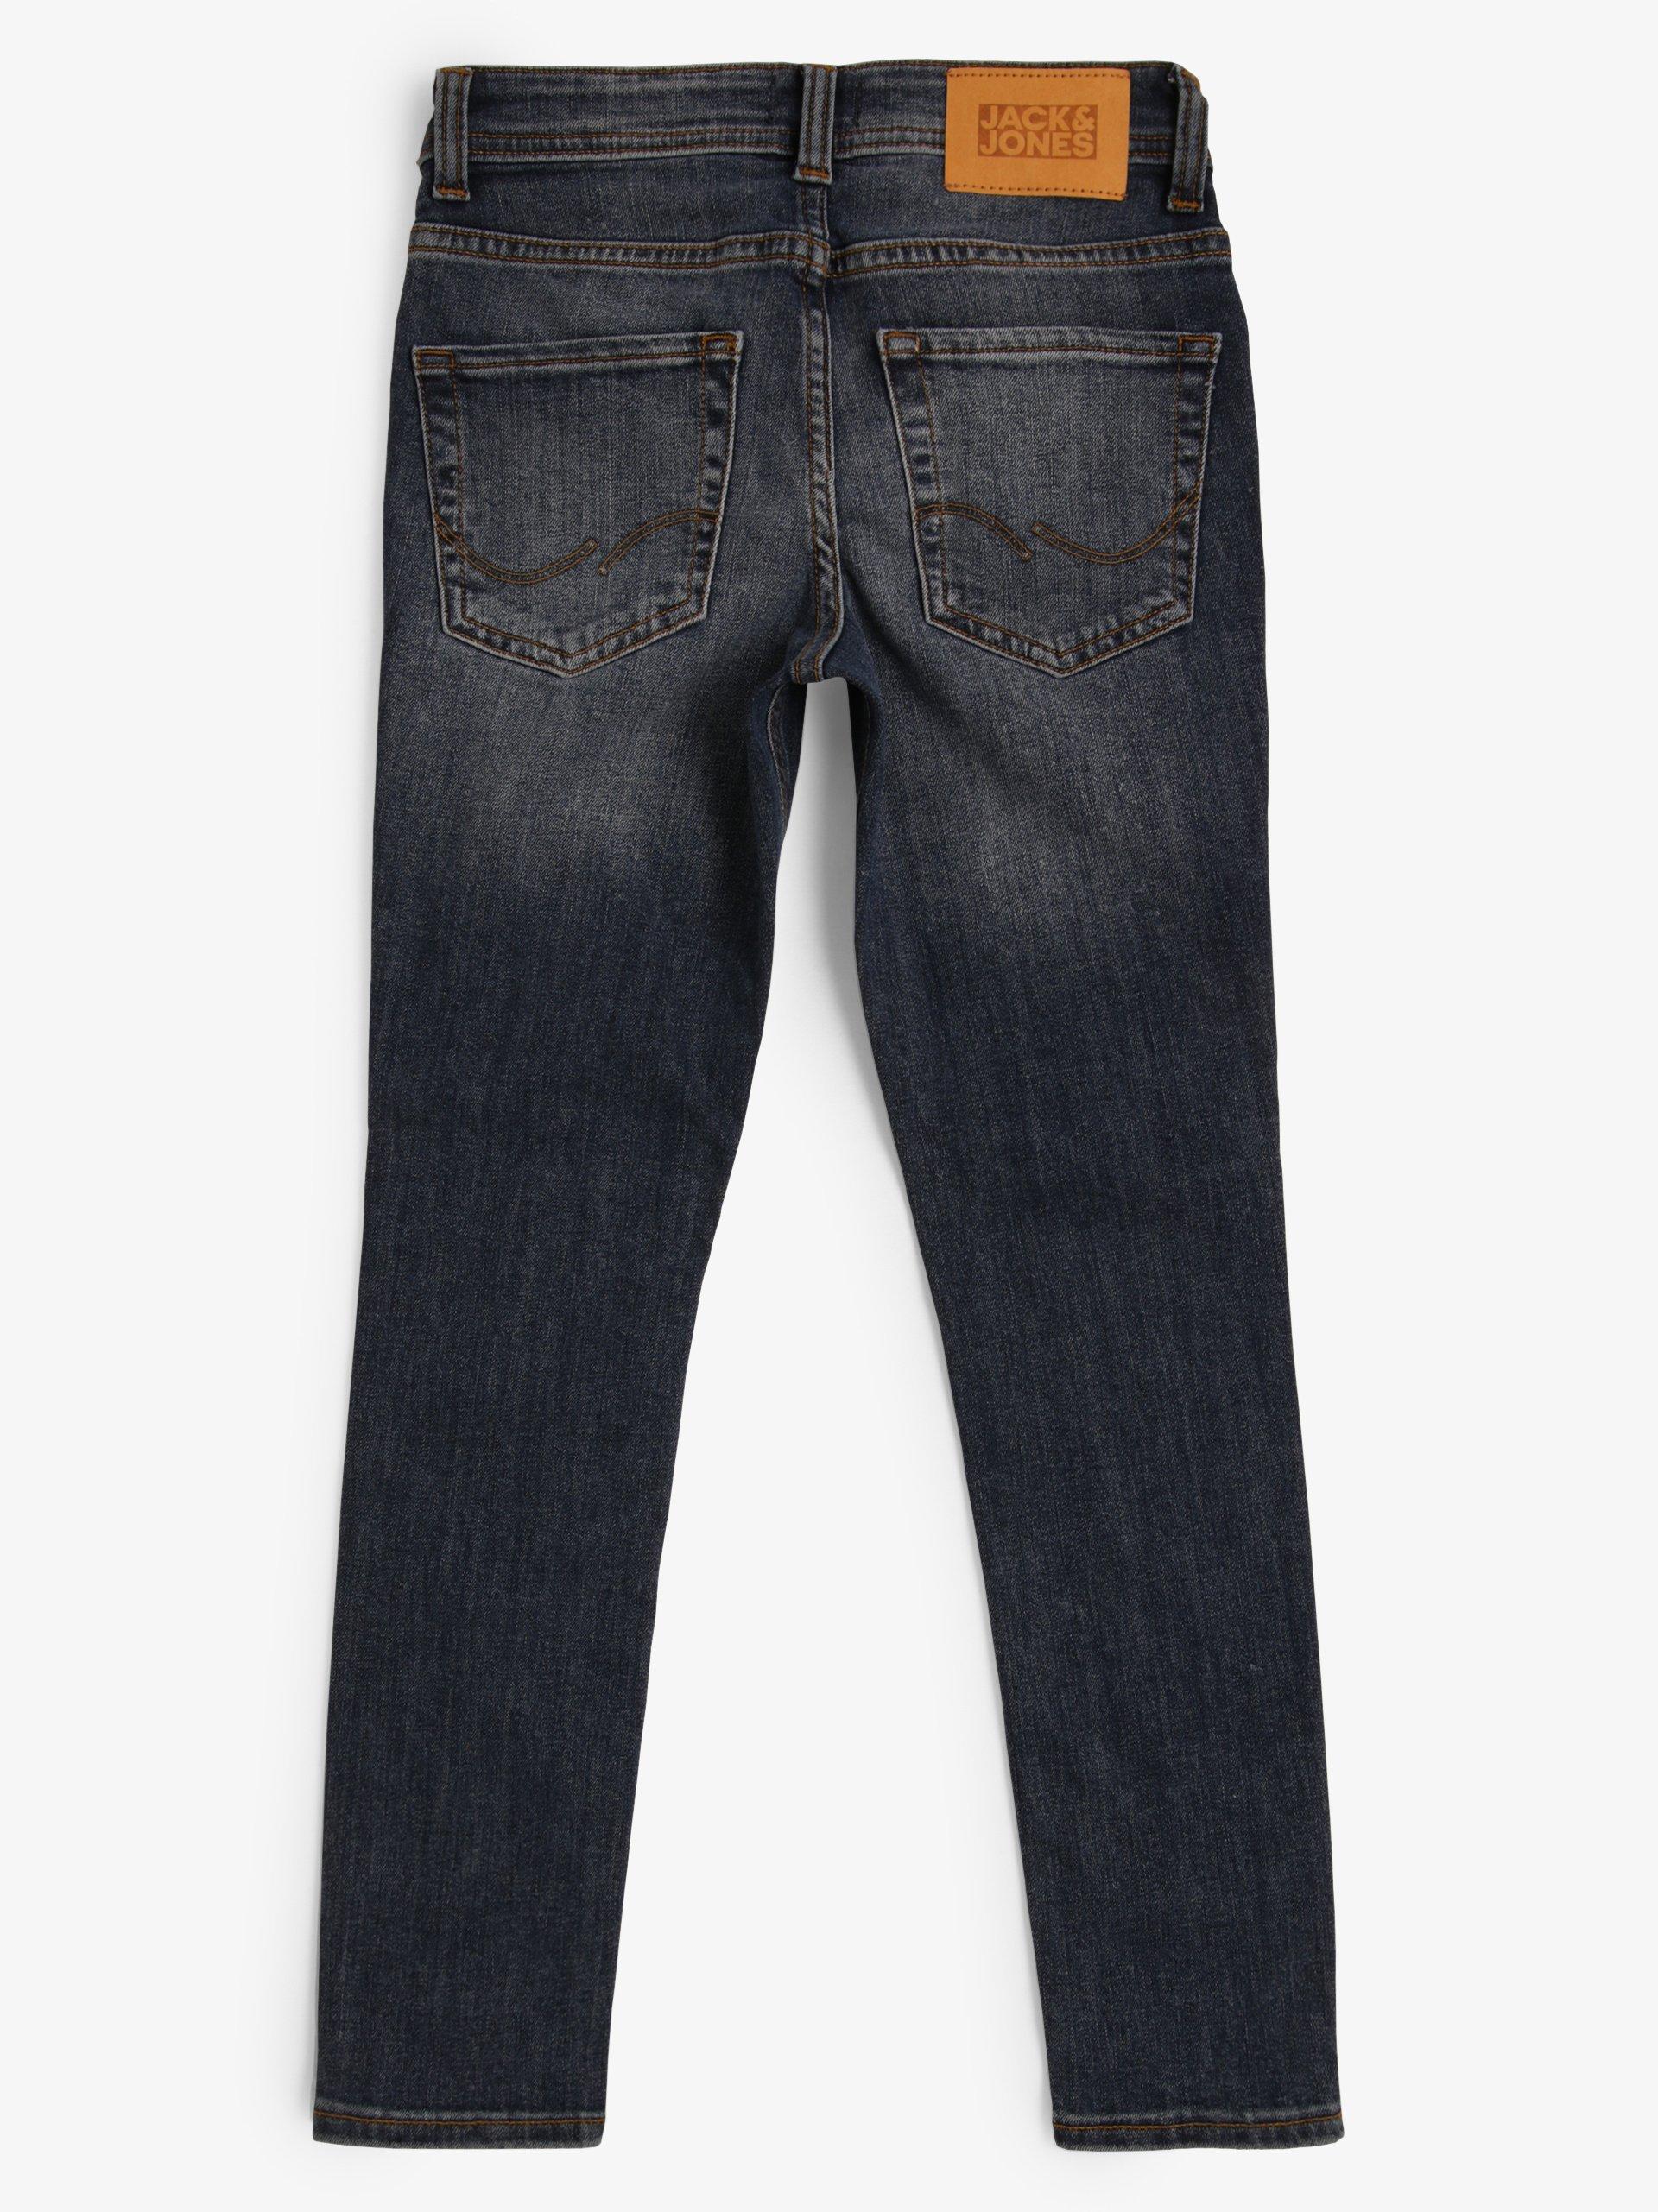 Jack & Jones Jungen Jeans Skinny Fit - Liam